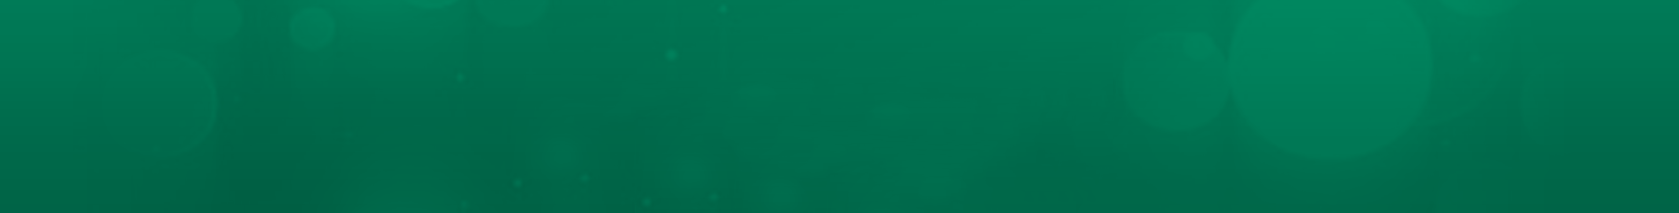 aboutus_banner_new branding